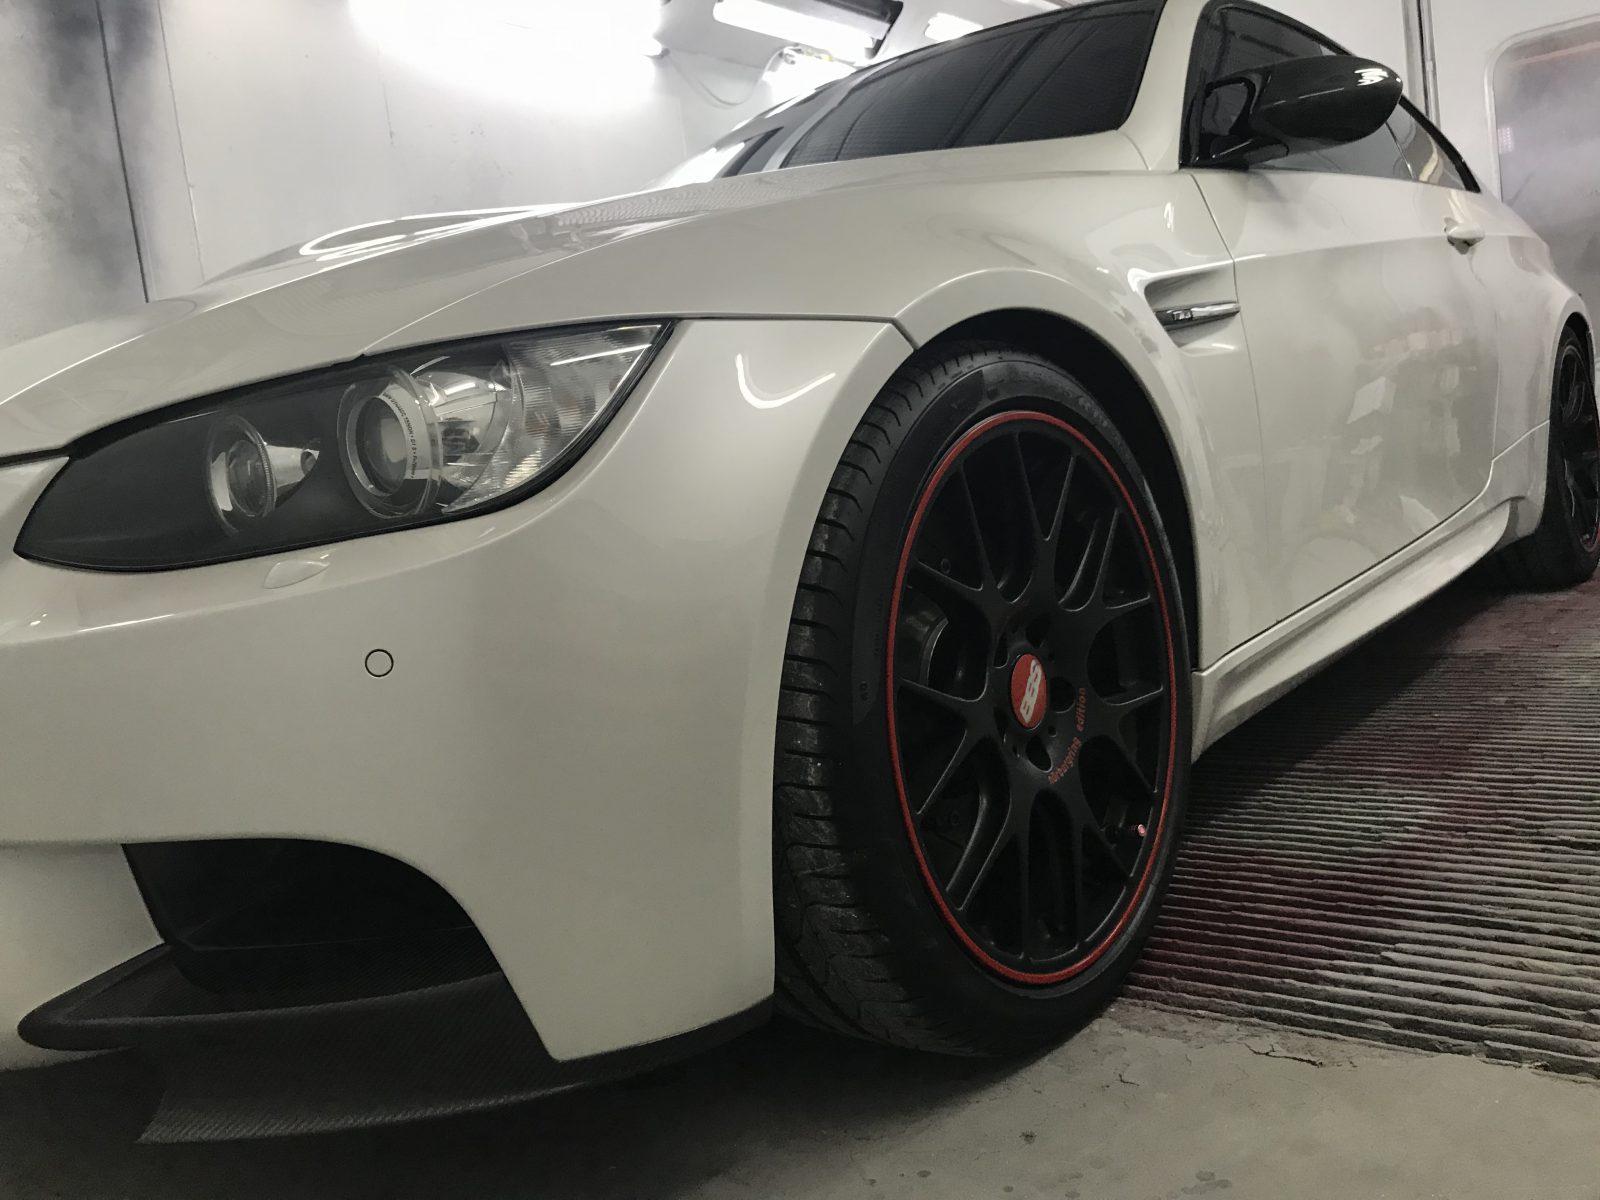 BMW M3 Spray Paint Whole Car